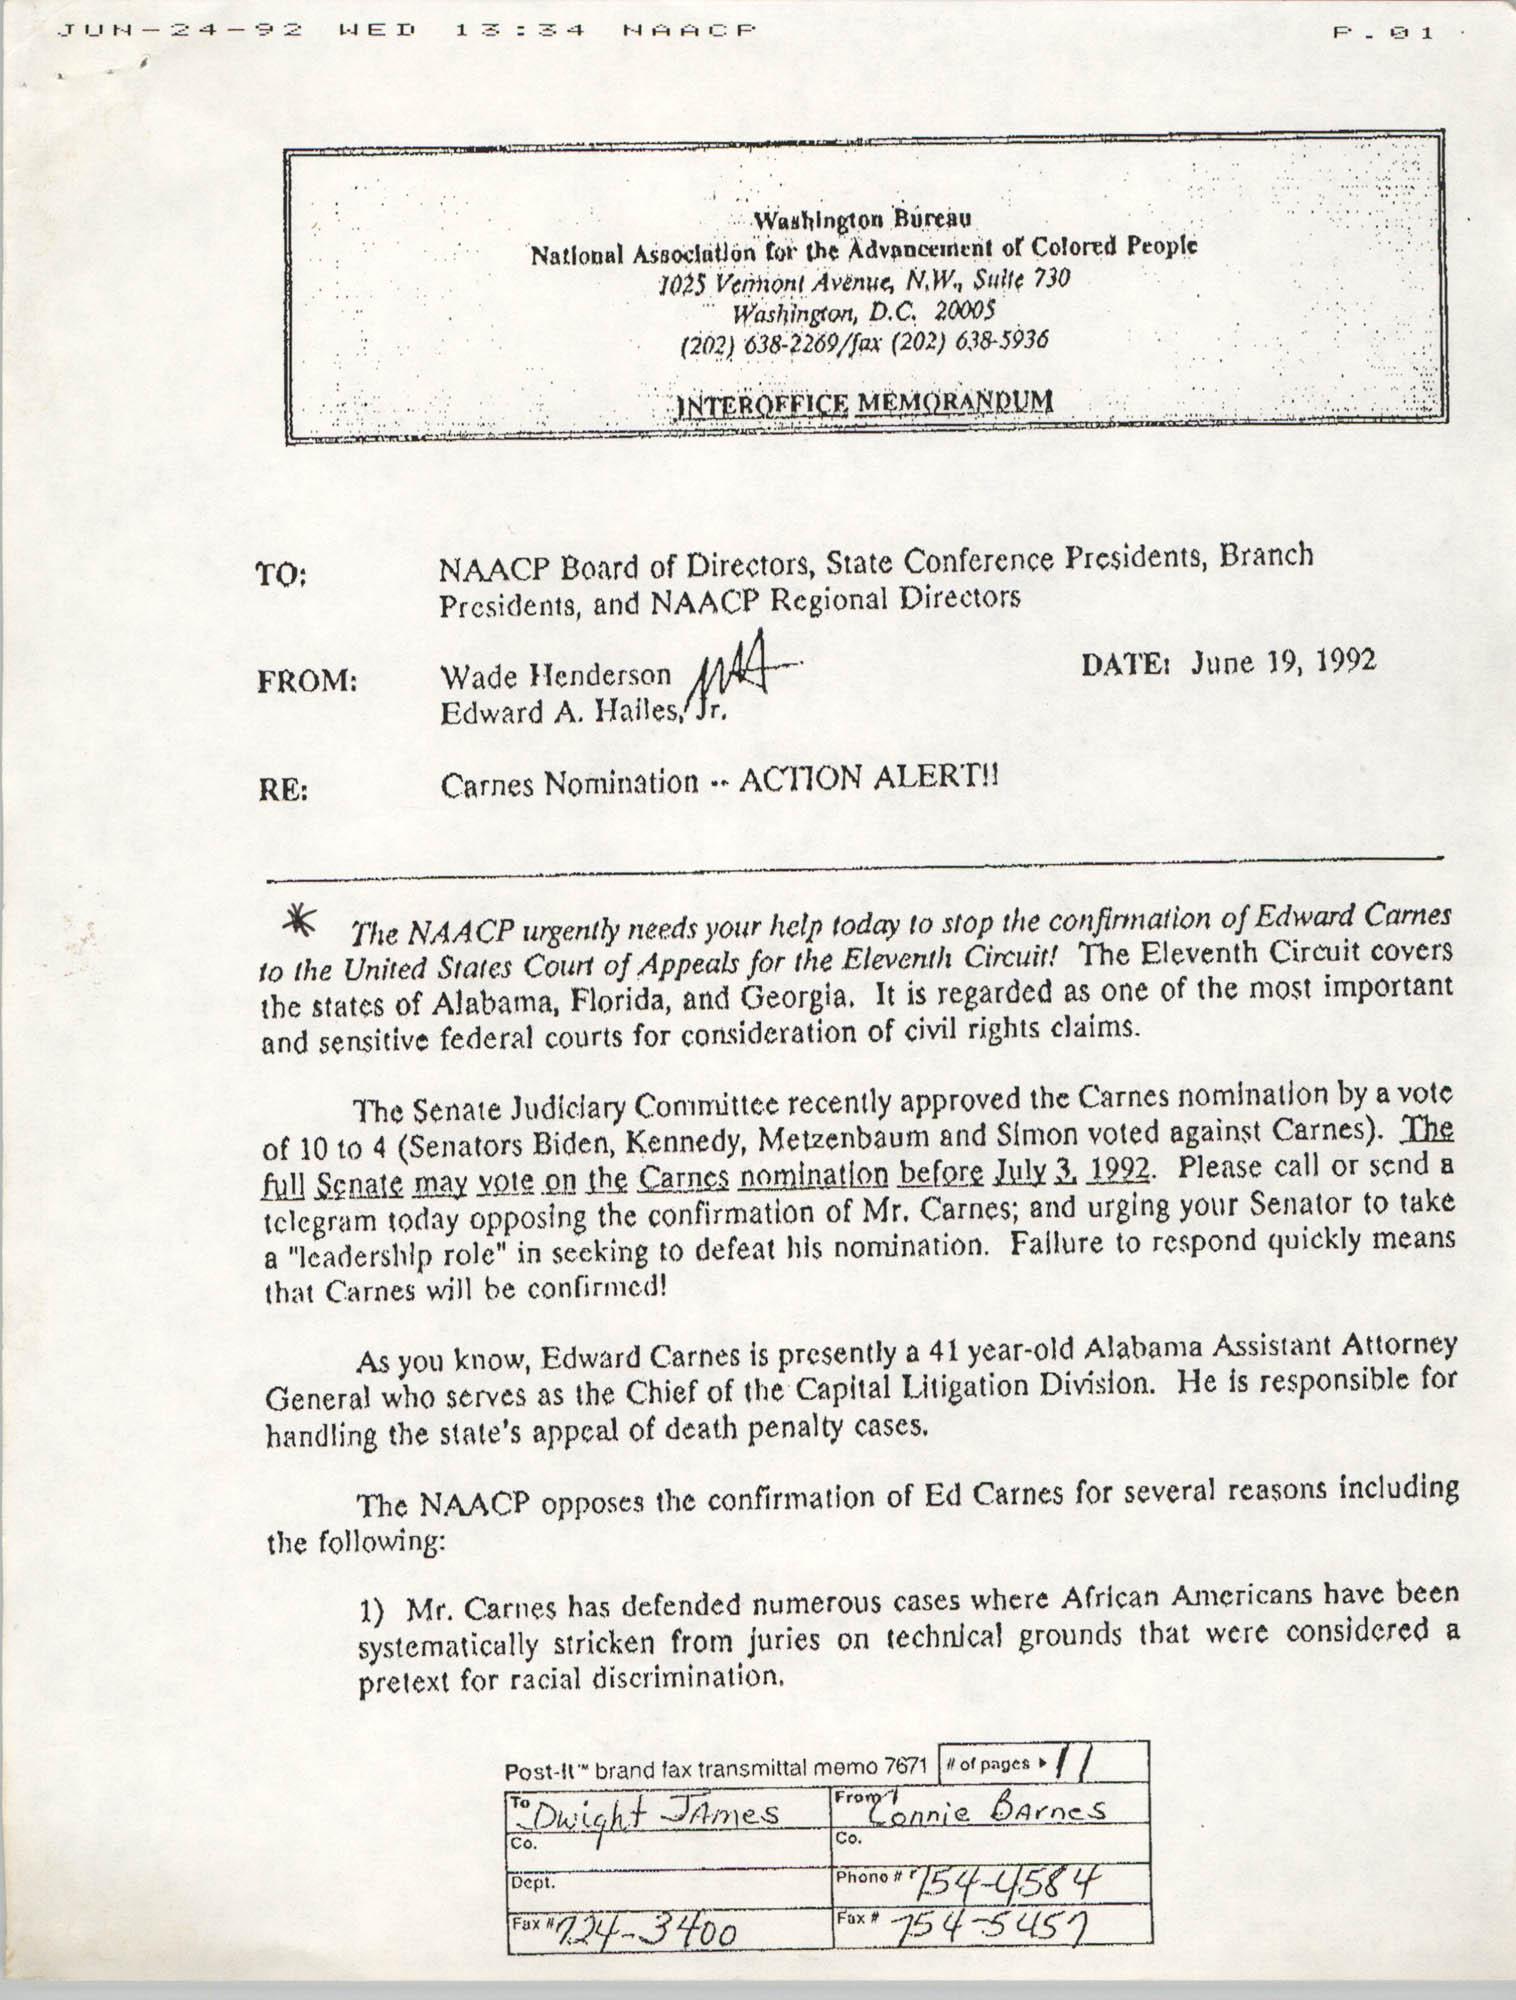 NAACP Washington Bureau Memorandum, June 19, 1992, Page 1